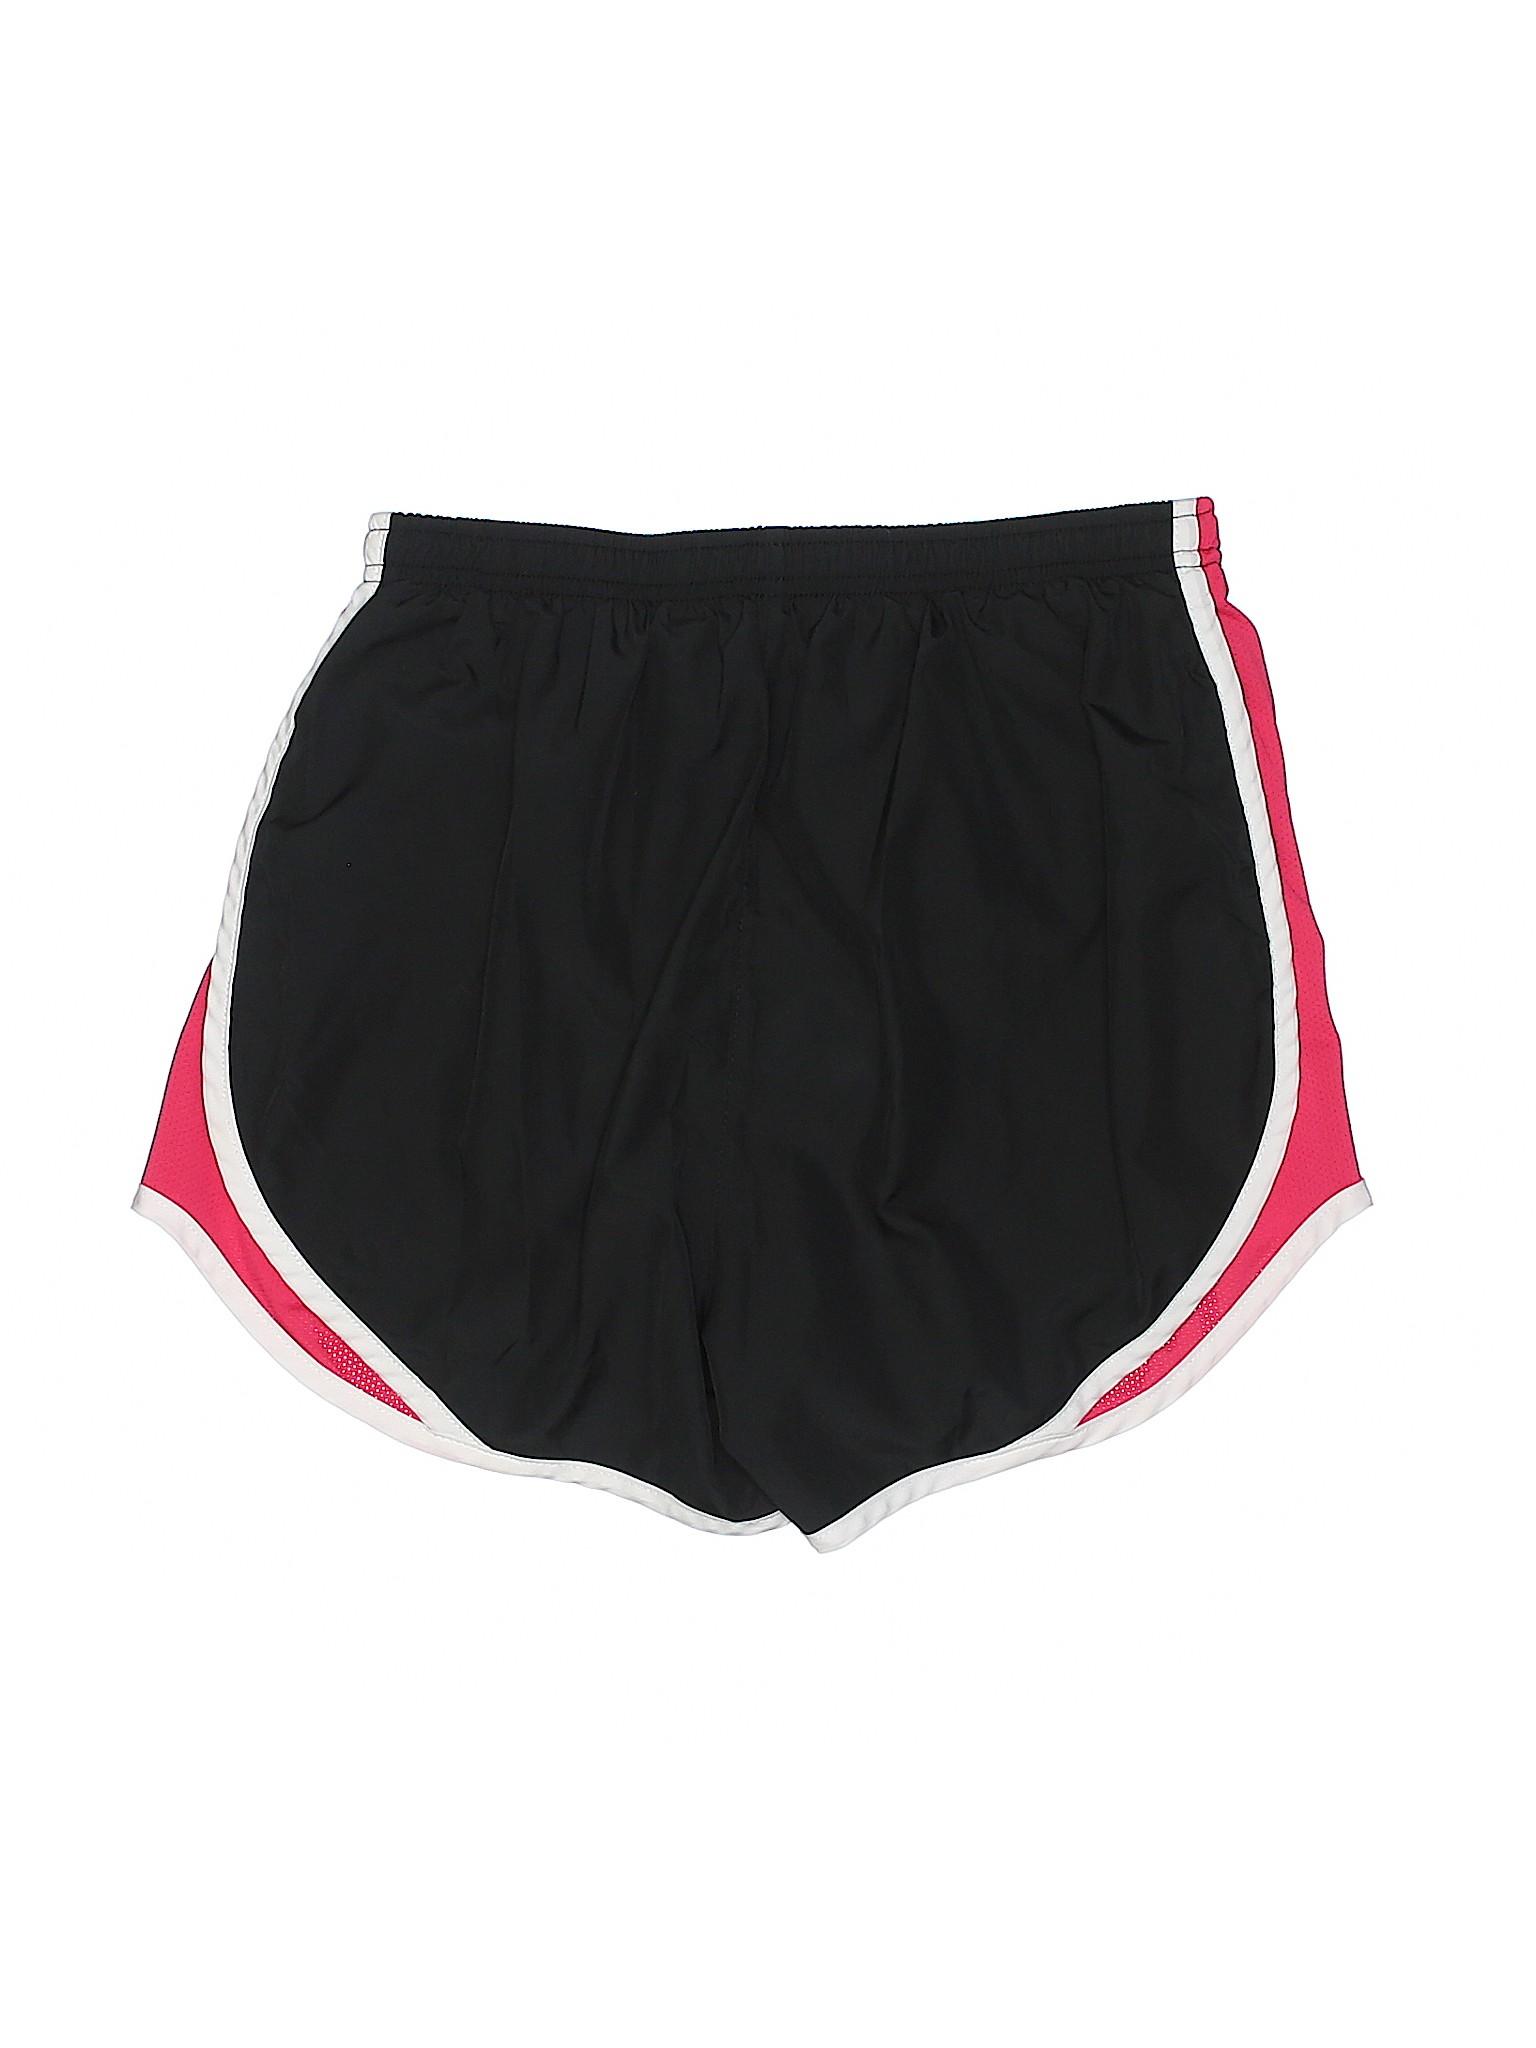 Athletic Shorts Boutique Boutique Nike Nike tR664Y